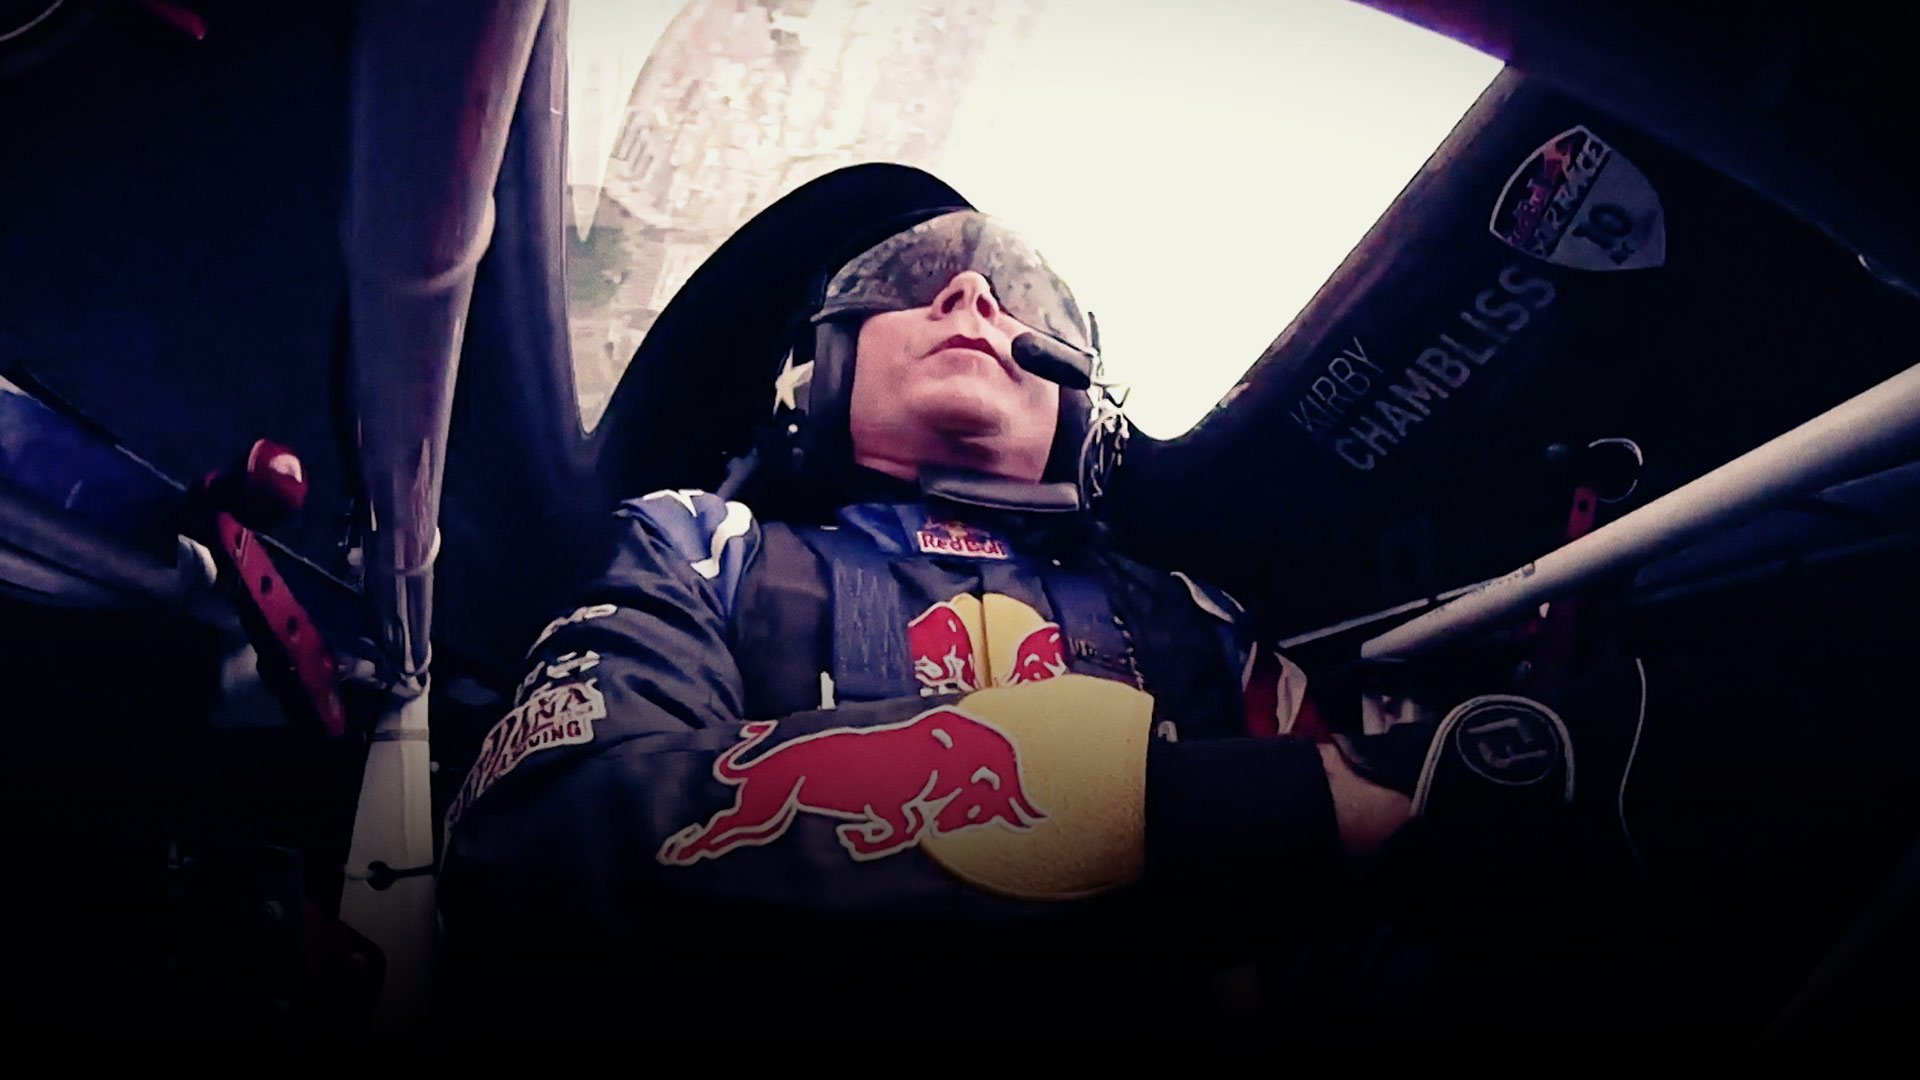 AIR RACE PARTNERSHIP